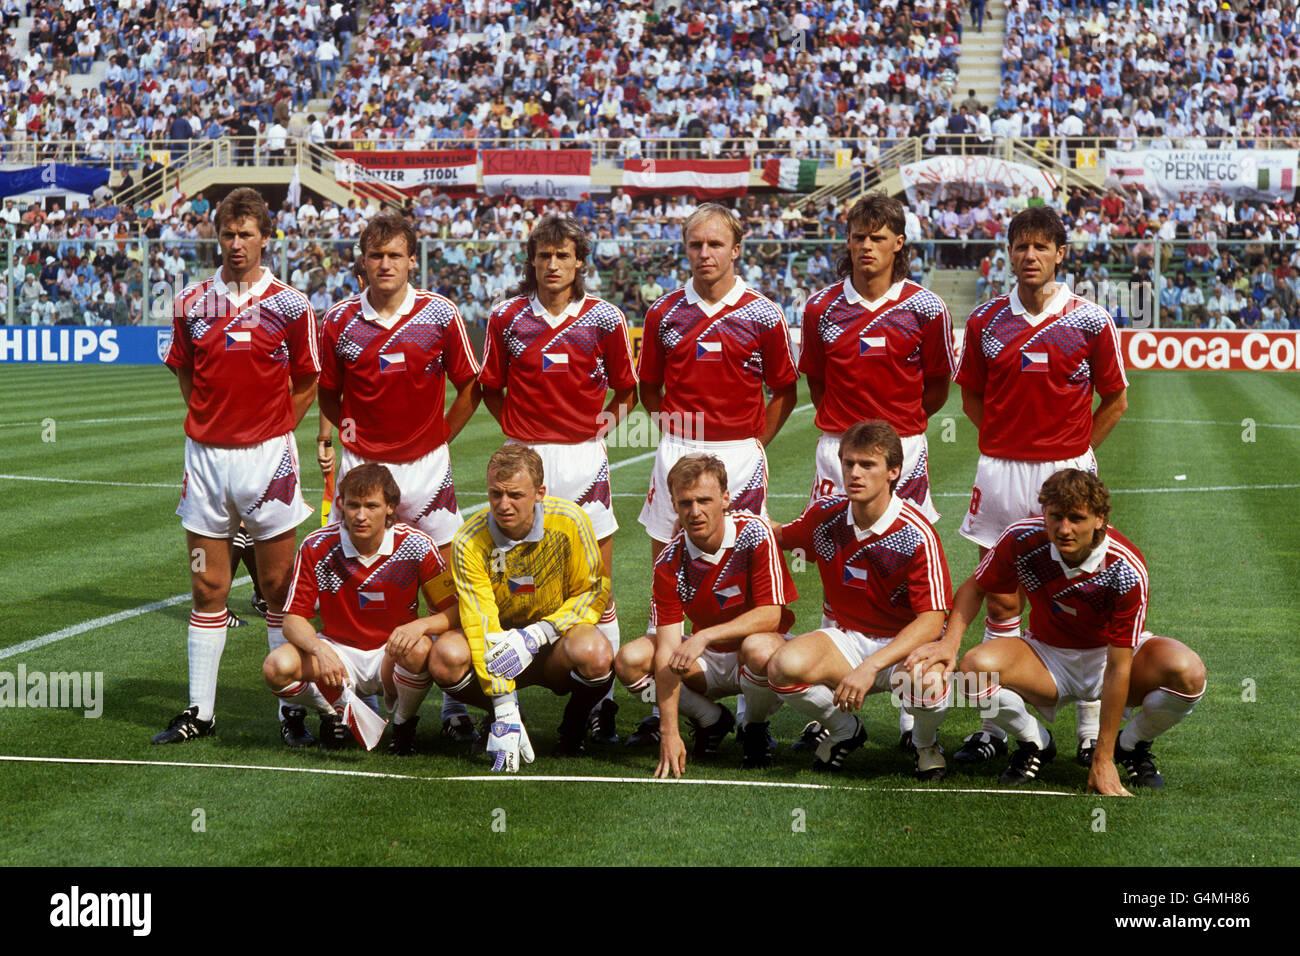 Soccer - FIFA World Cup Italia 90 - Group A - Austria v Czechoslovakia - Stadio Comunale, Florence - Stock Image